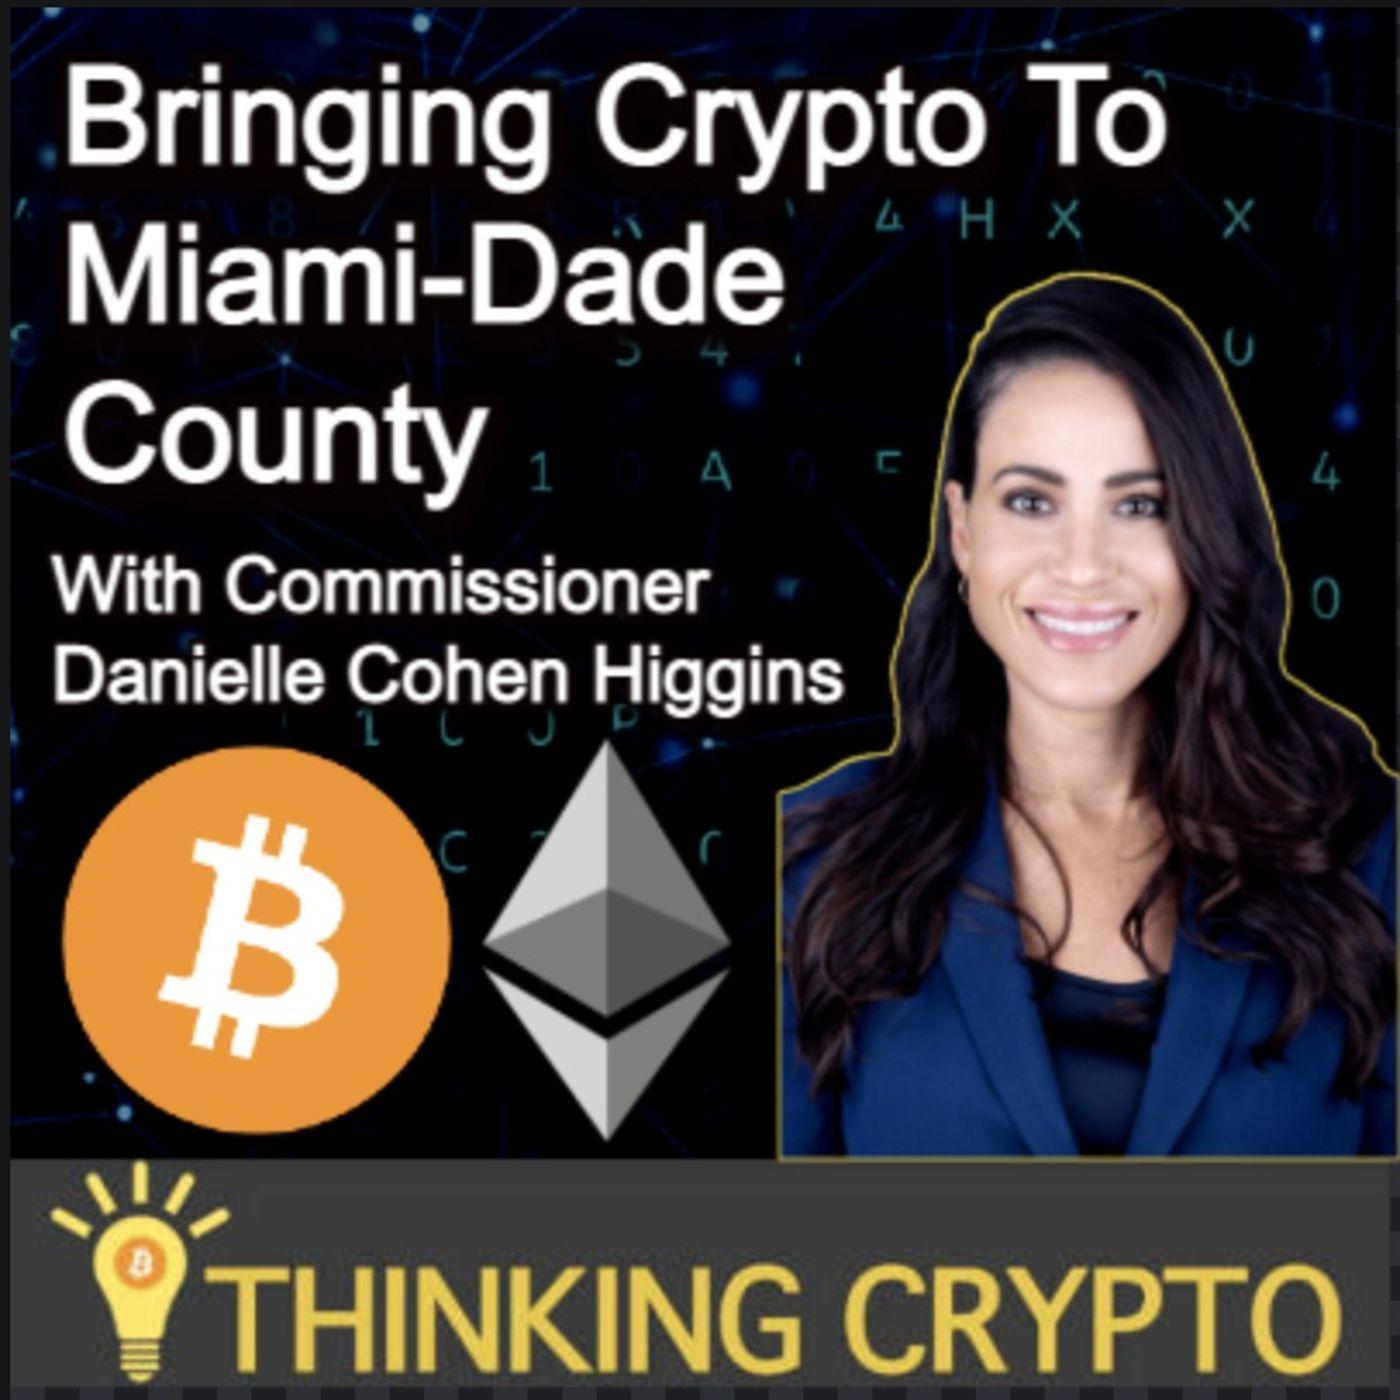 Commissioner Danielle Cohen Higgins Interview - Bringing Crypto to Miami Dade County